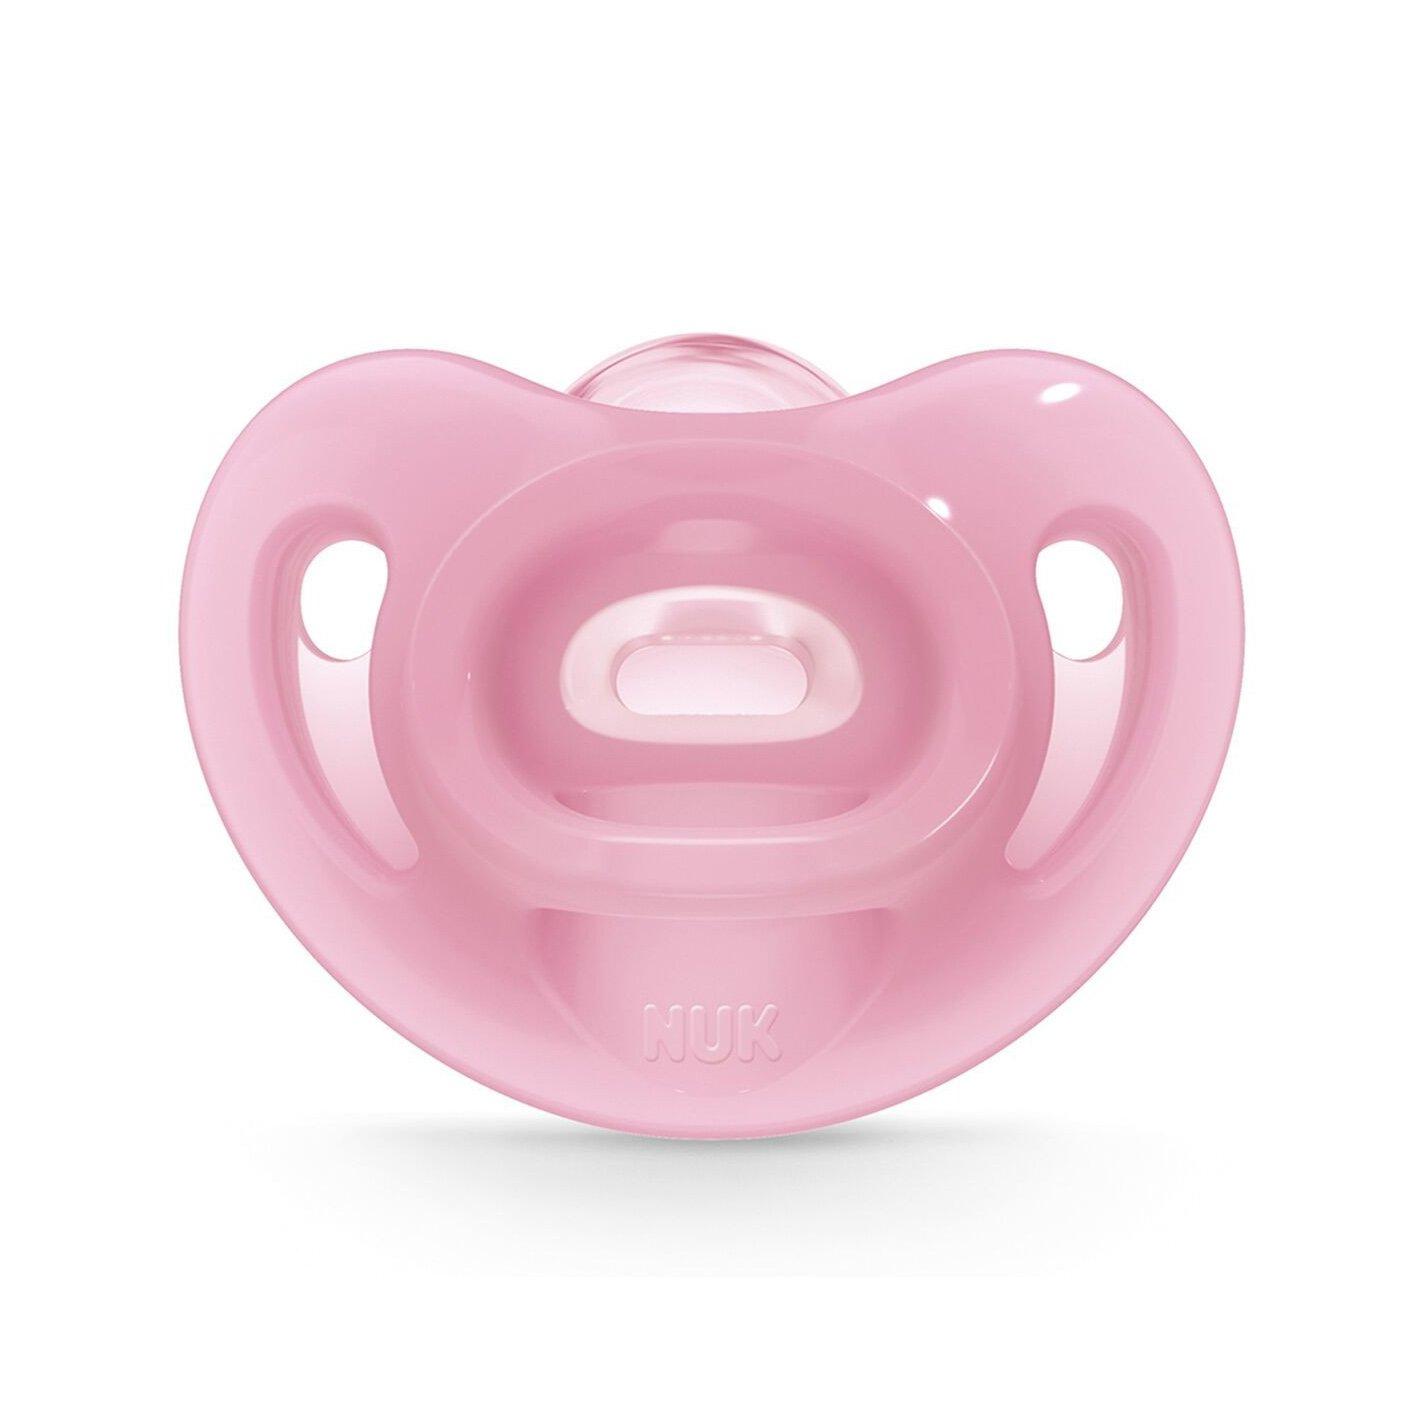 Nuk Sensitive Πιπίλα Όλο Σιλικόνη Εξαιρετικά Μαλακή & Εύκαμπτη 1 Τεμάχιο – 6-18 Μηνών Ροζ